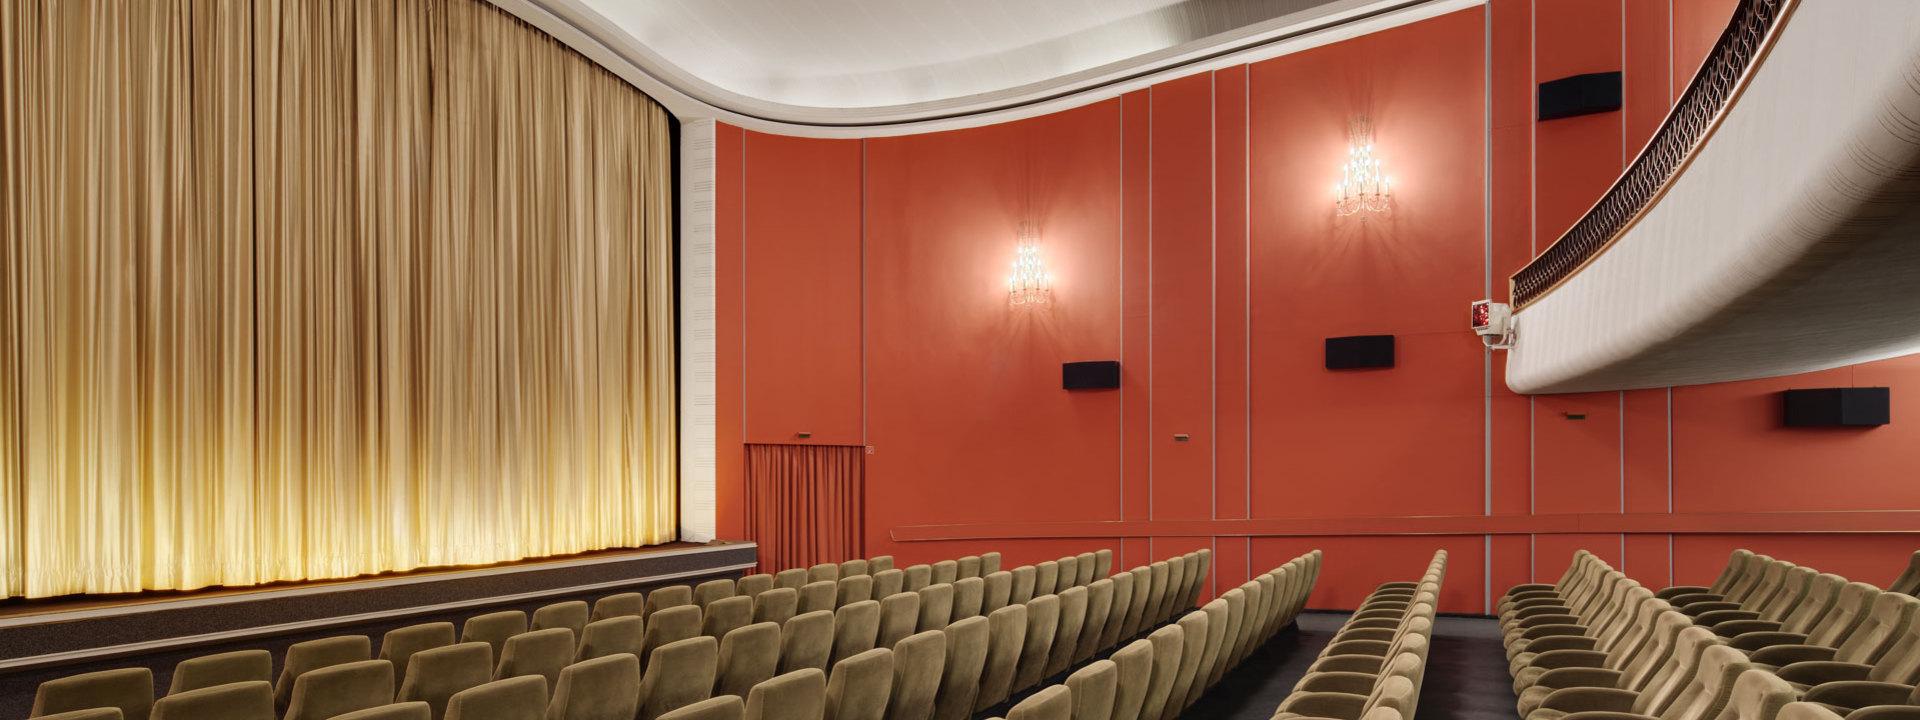 Lux Kino Frankenthal Programm Heute